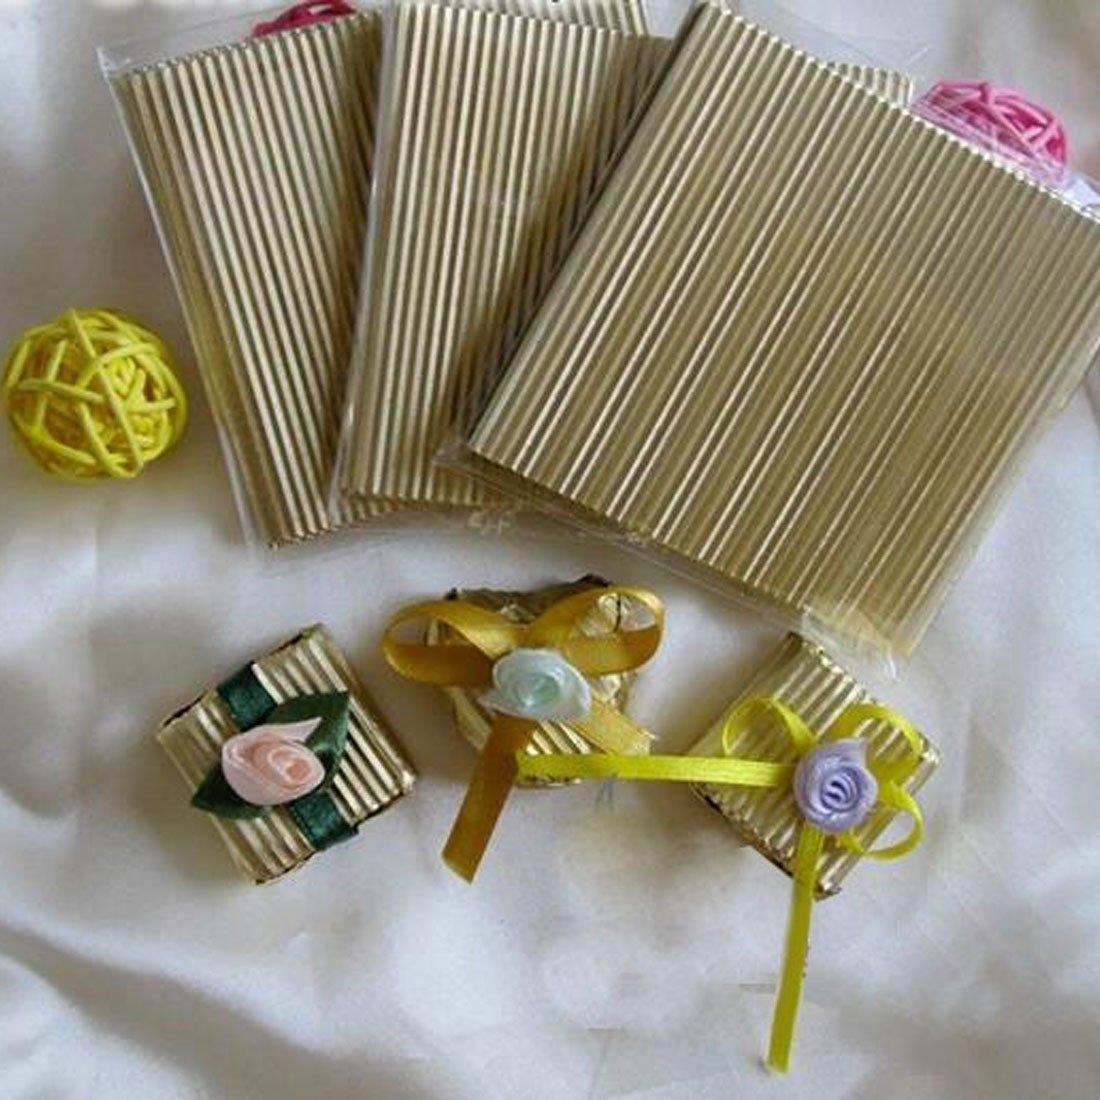 Amazon.com: eDealMax papel de aluminio desechables Wrap para hornear magdalenas muffins de chocolate del papel de estaño de papel de 11 x 11cm 100pcs ...